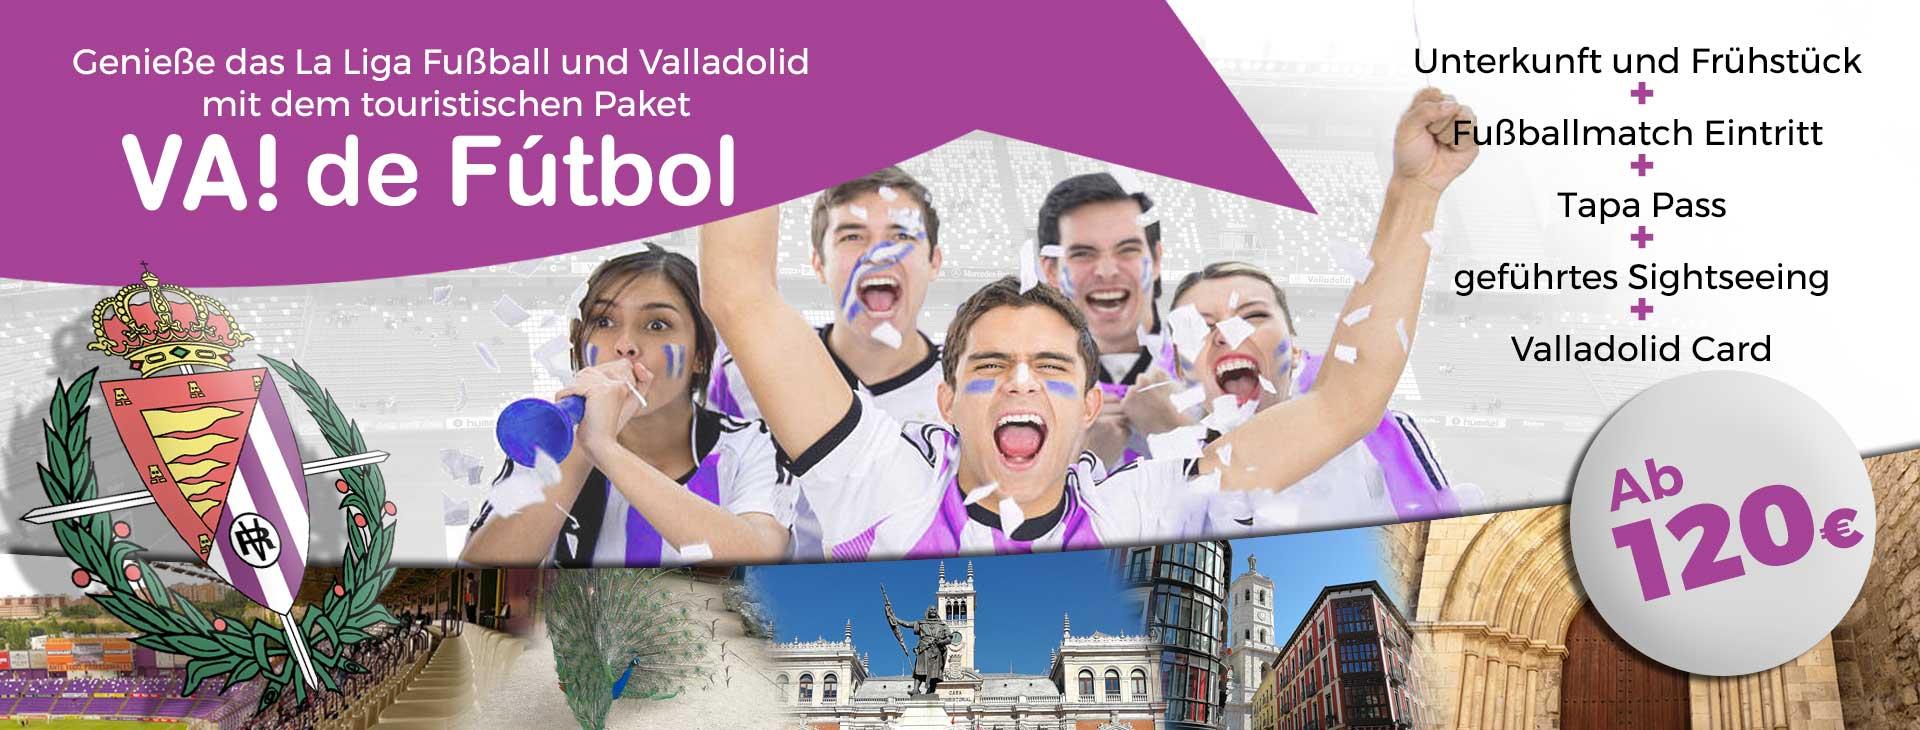 VA de Fútbol 1